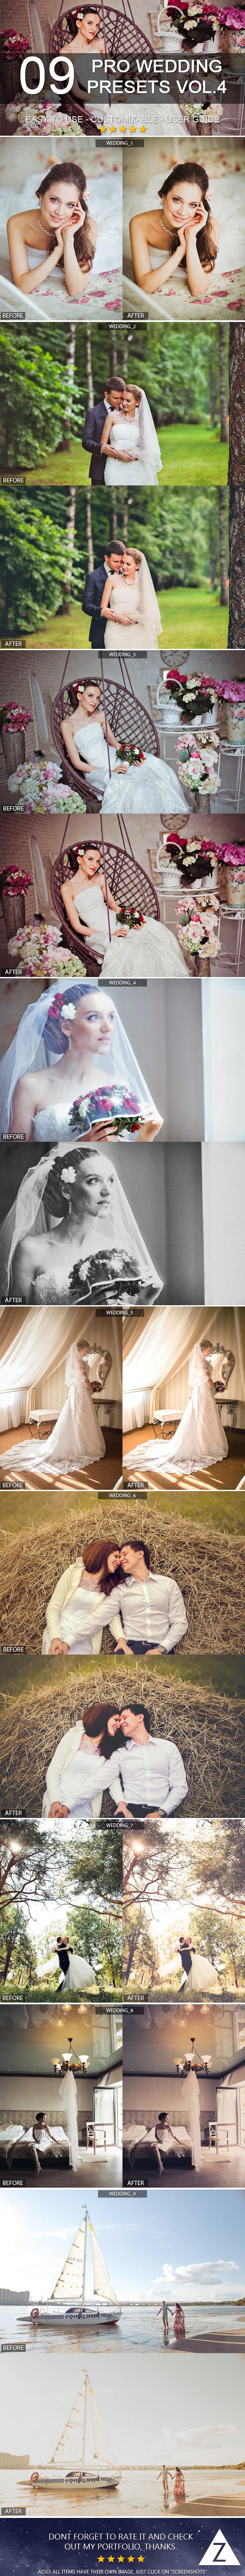 9 Pro Wedding Presets vol.4 - Wedding Lightroom Presets